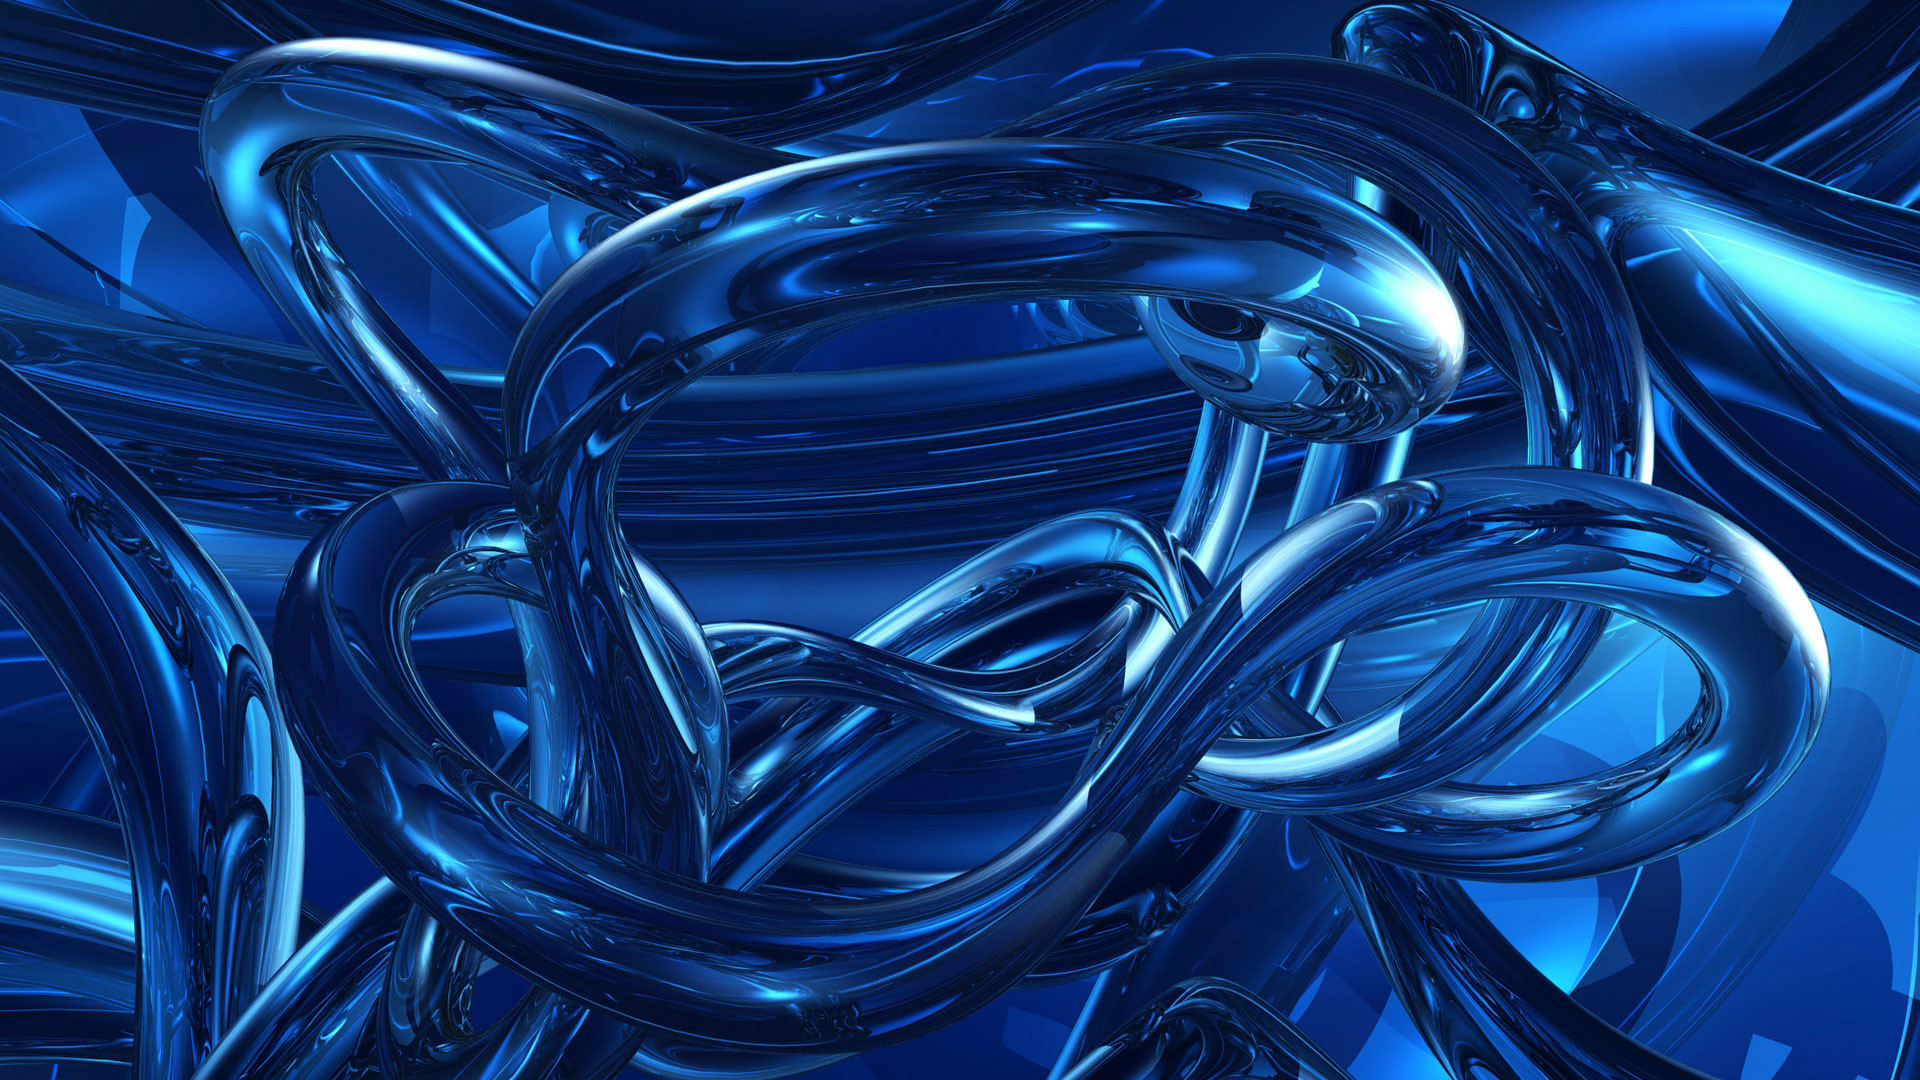 https://www.hdwallpapers.in/walls/dark_blue_abstracts-HD.jpg | Digital  Abstract Art | Pinterest | Dark blue, Wallpaper and 3d